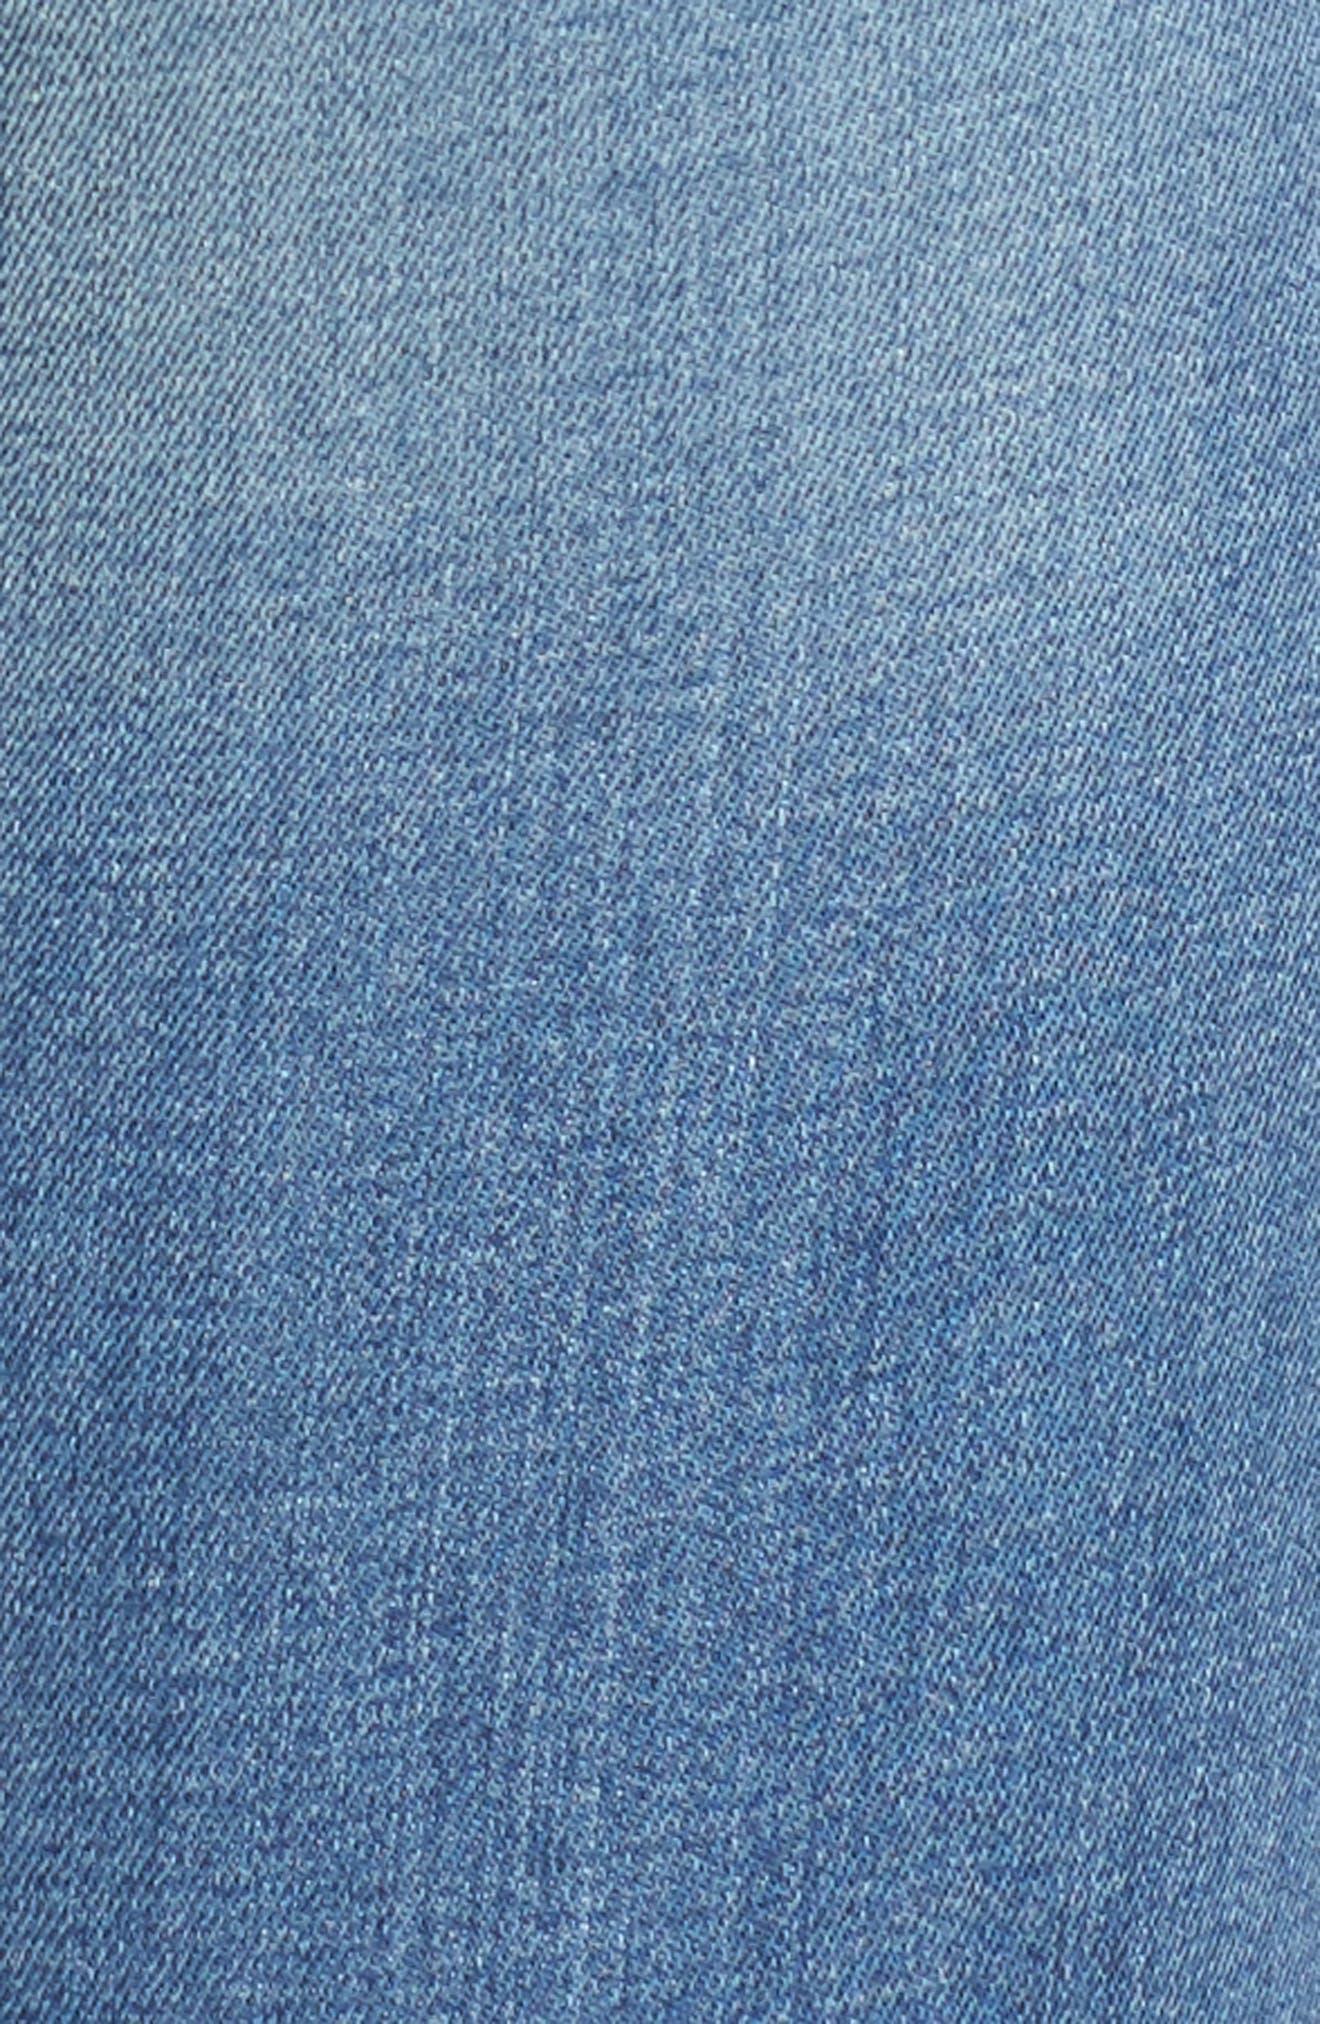 Florence Instasculpt Skinny Jeans,                             Alternate thumbnail 5, color,                             Godiva